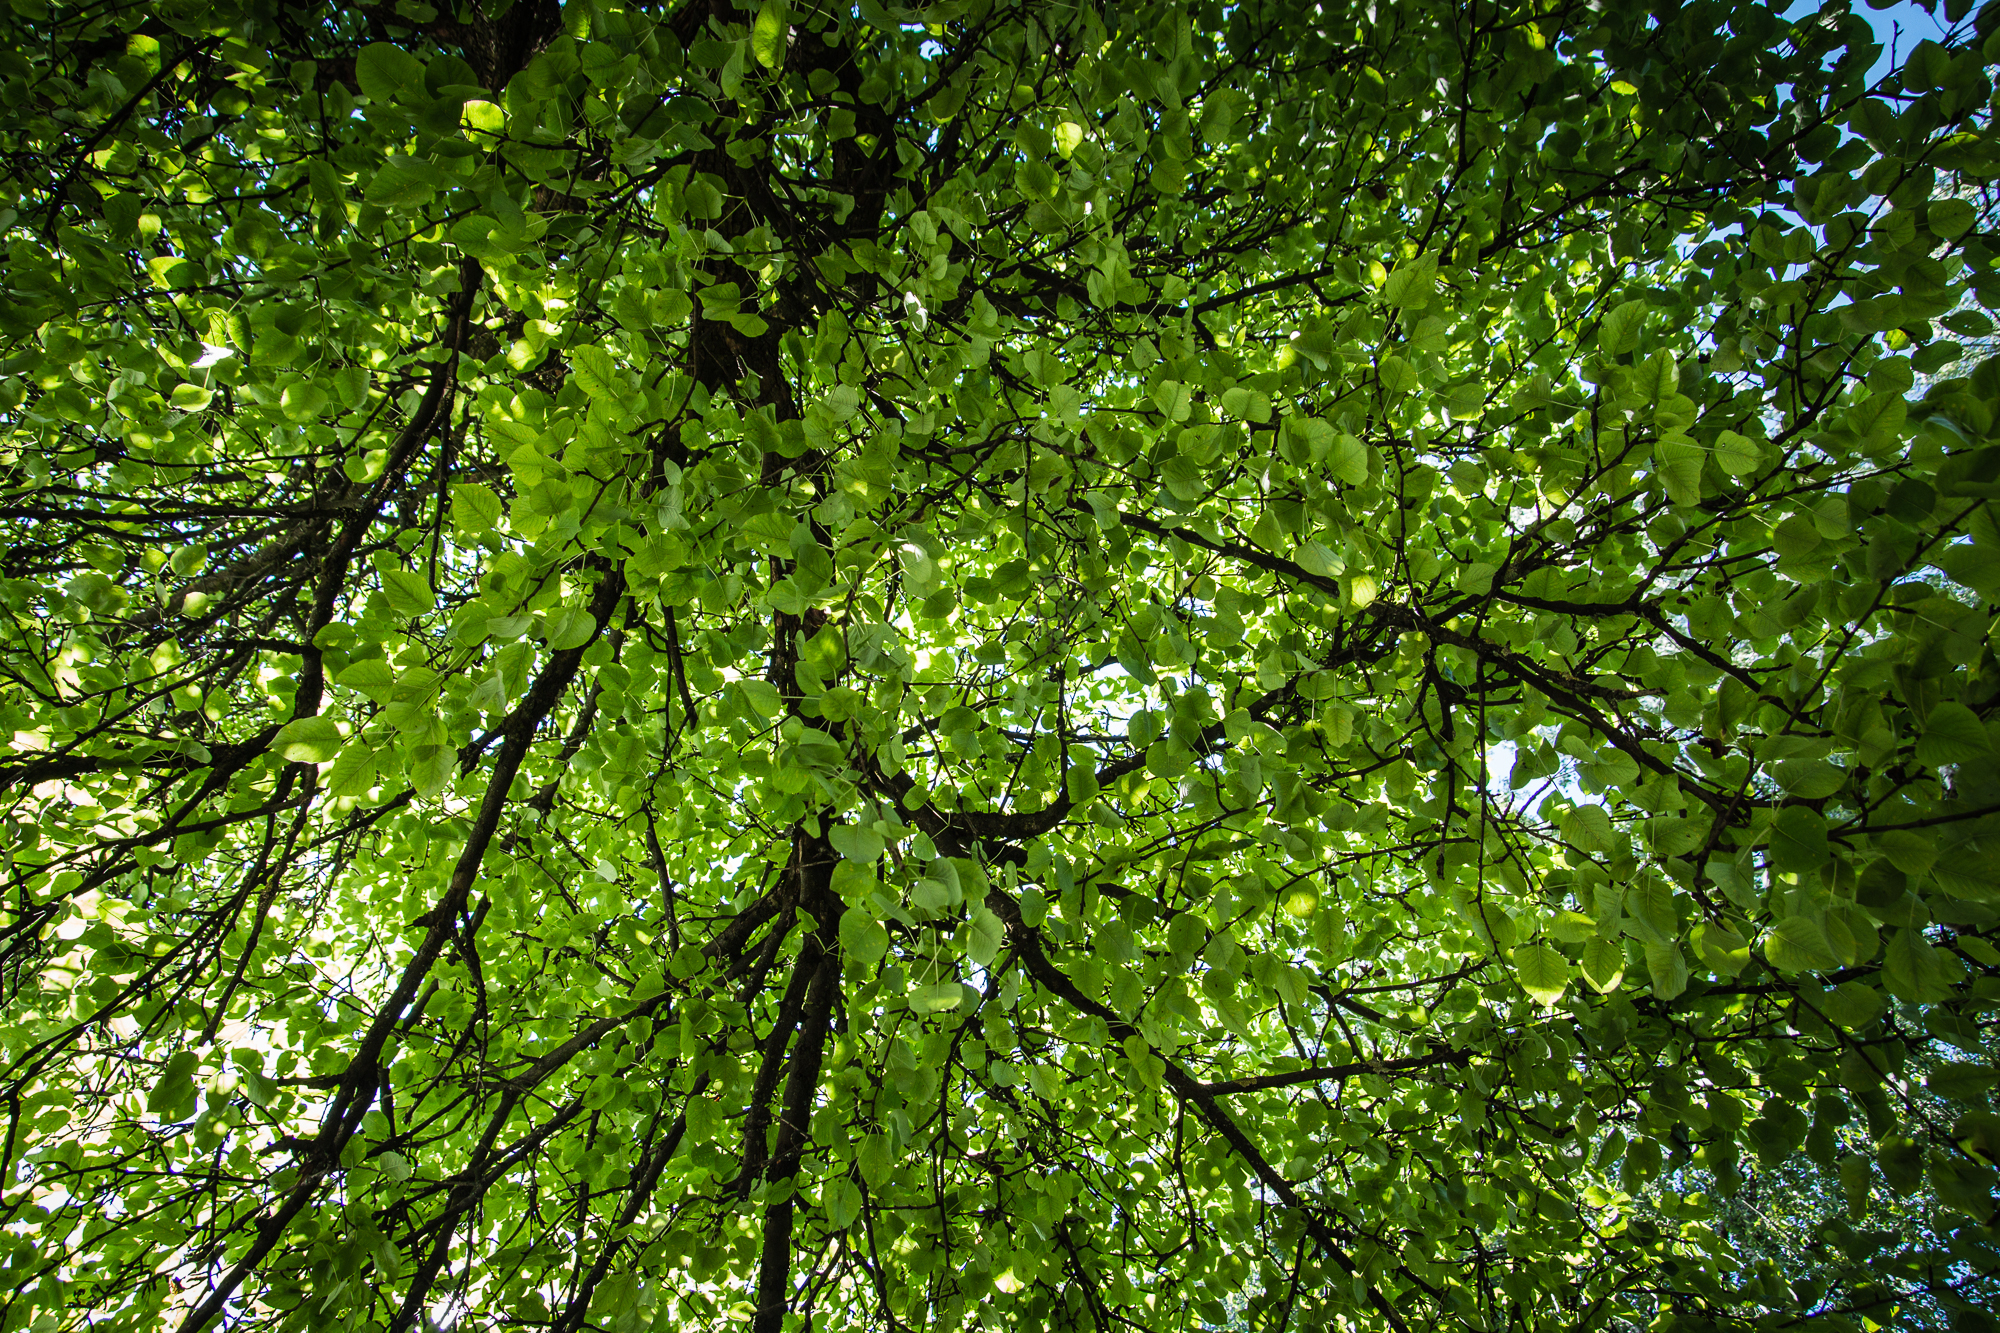 Green Leaves Via @Atisgailis